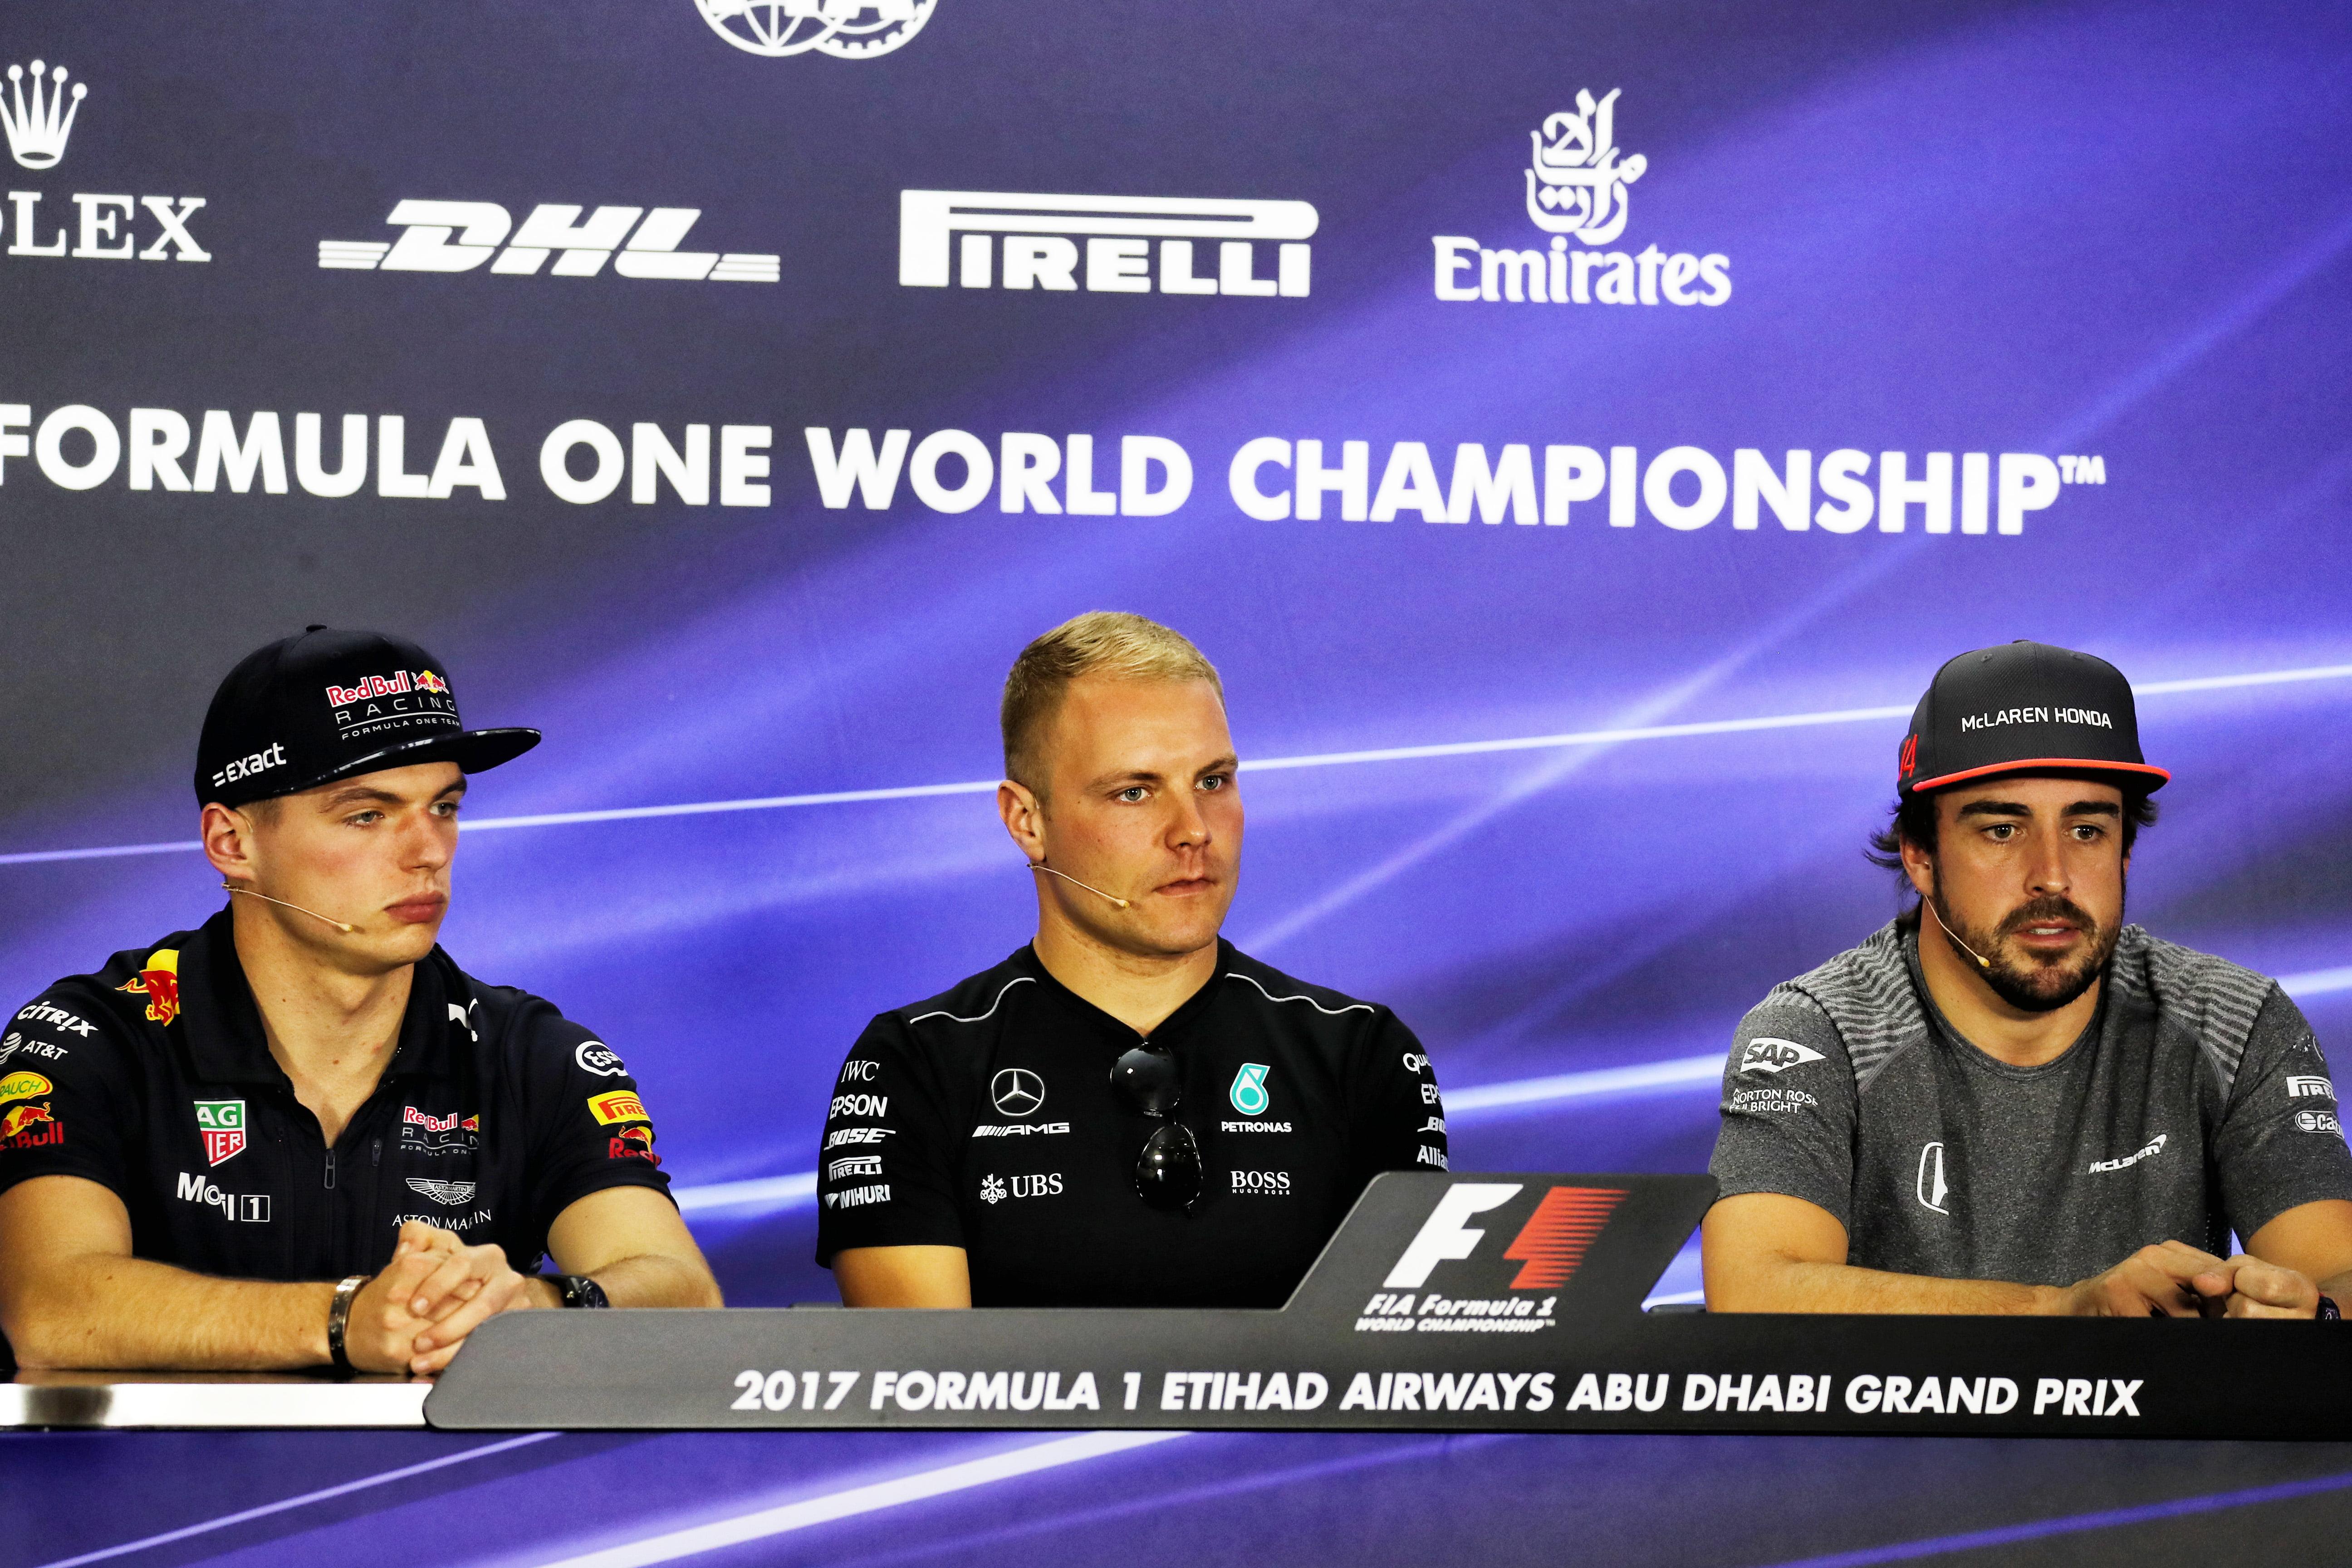 Formula One World Championship 2017, Round 20, Abu Dhabi Grand Prix, Abu Dhabi, United Arab Emirates, Thursday 23 November 2017 – The FIA Press Conference (L to R): Max Verstappen (NLD) Red Bull Racing; Valtteri Bottas (FIN) Mercedes AMG F1; Fernando Alonso (ESP) McLaren.